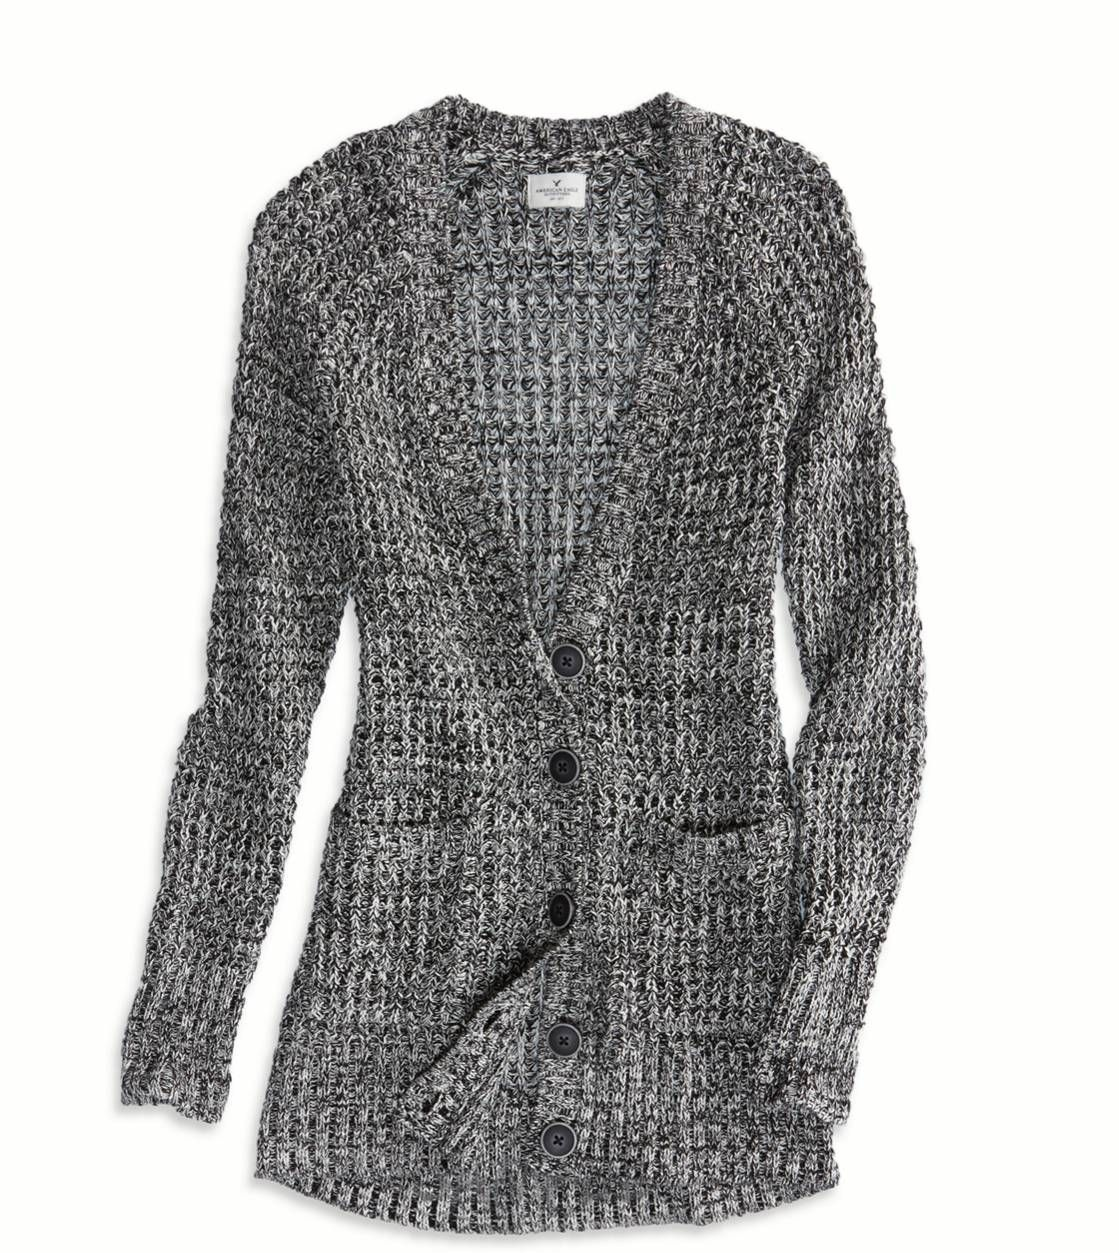 Cozy Winter Sweaters | POPSUGAR Fashion